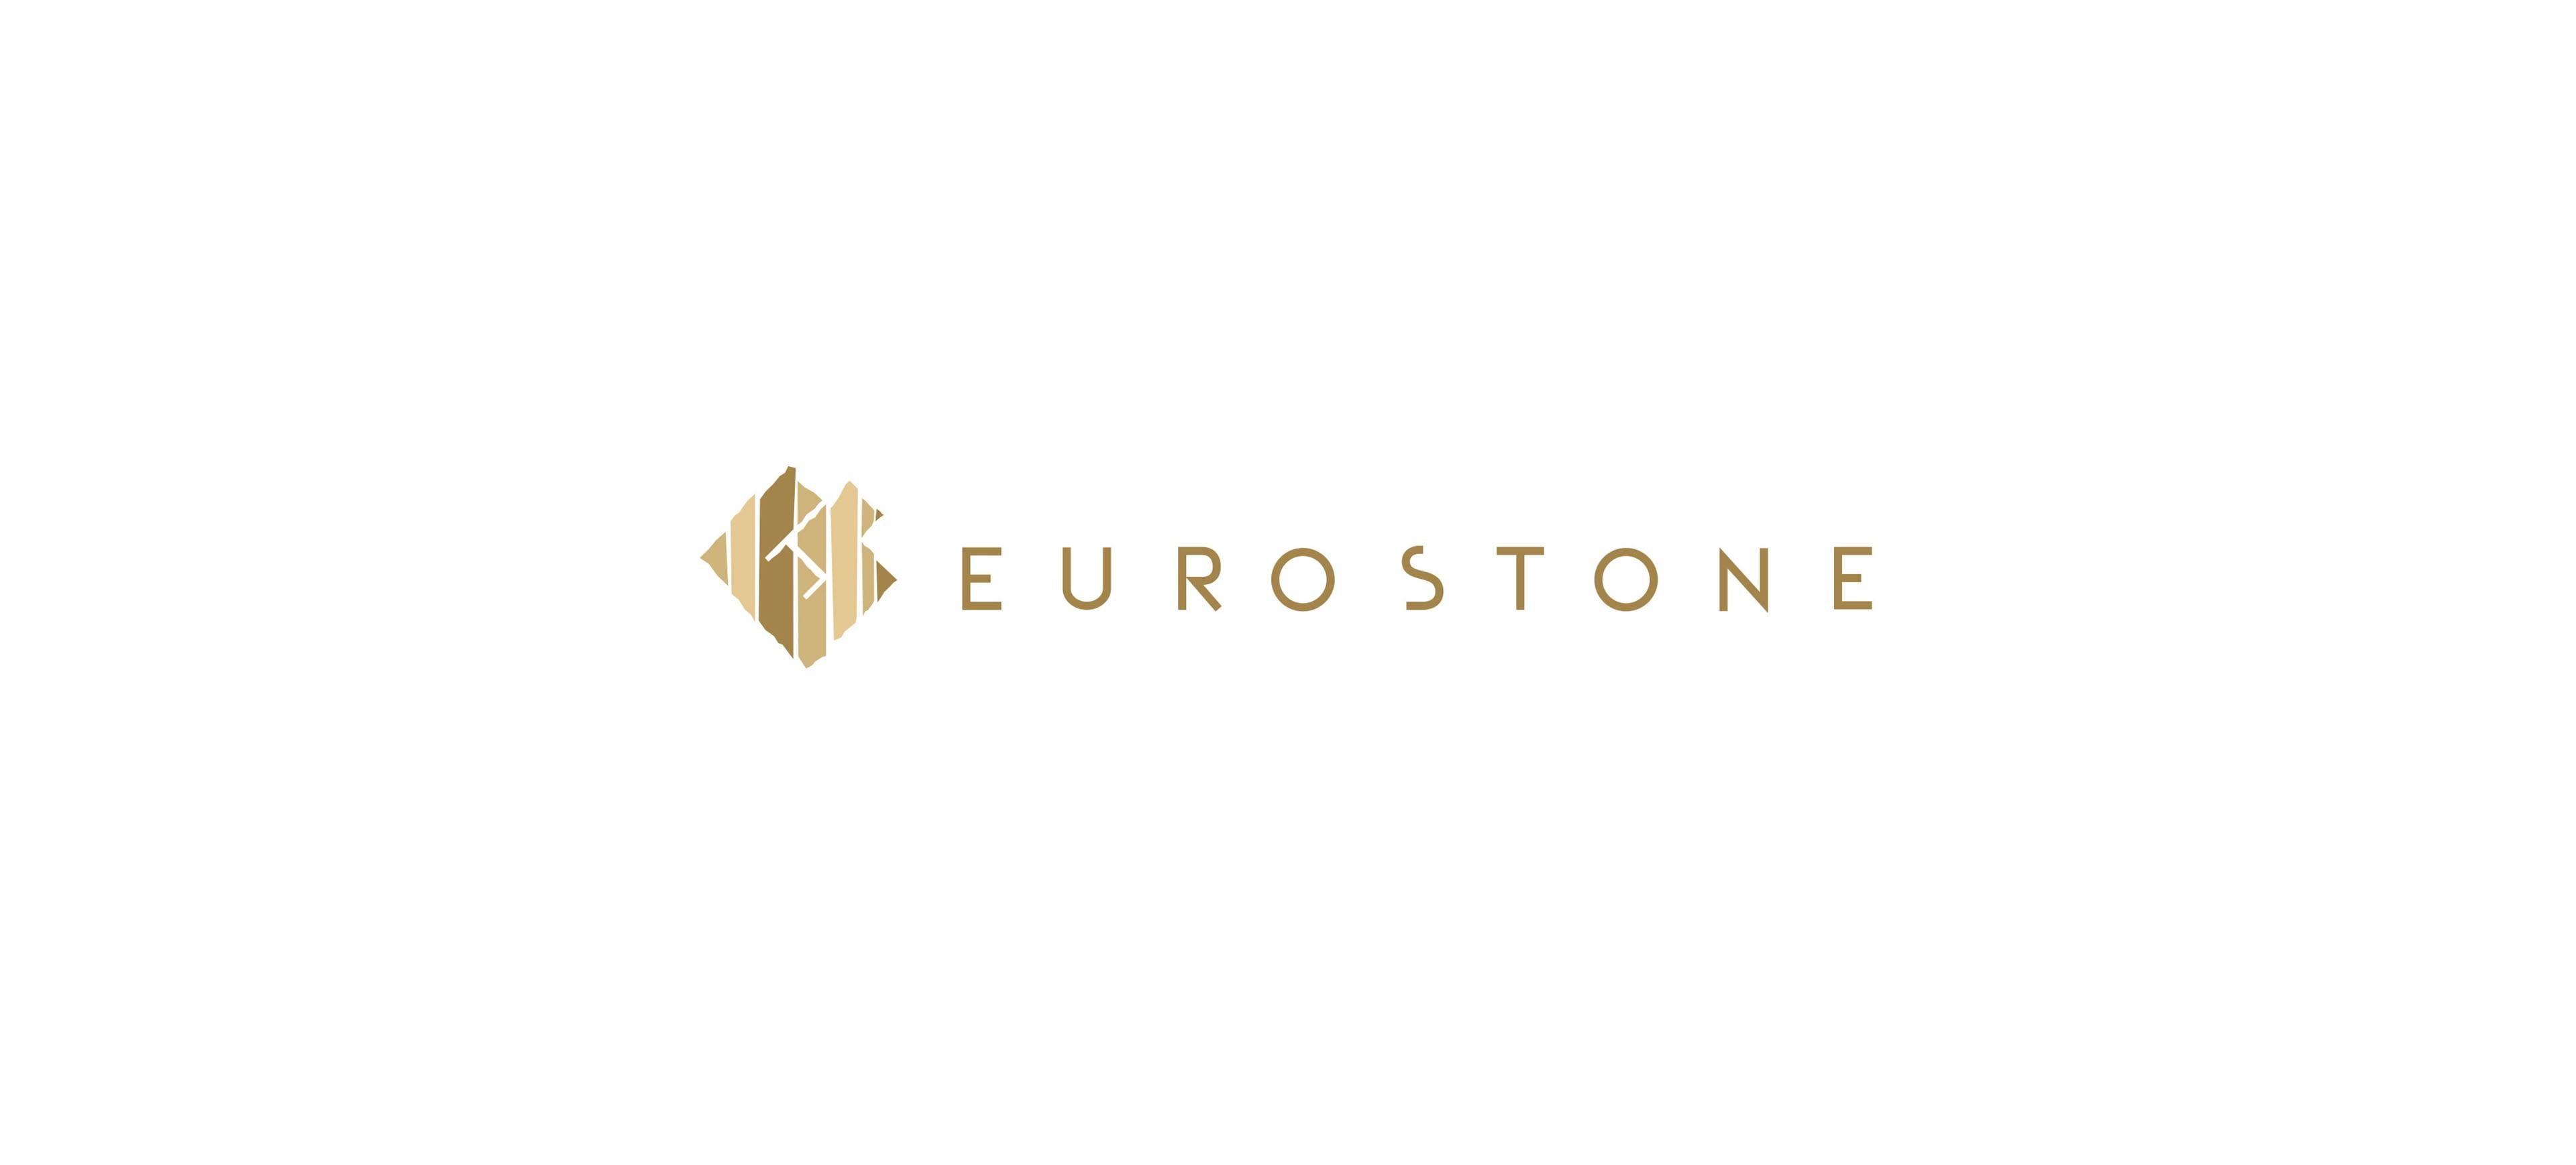 Logo Eurostone wersja pozioma Realizacja Sto15 Studio Projektant Piotr Ratuski